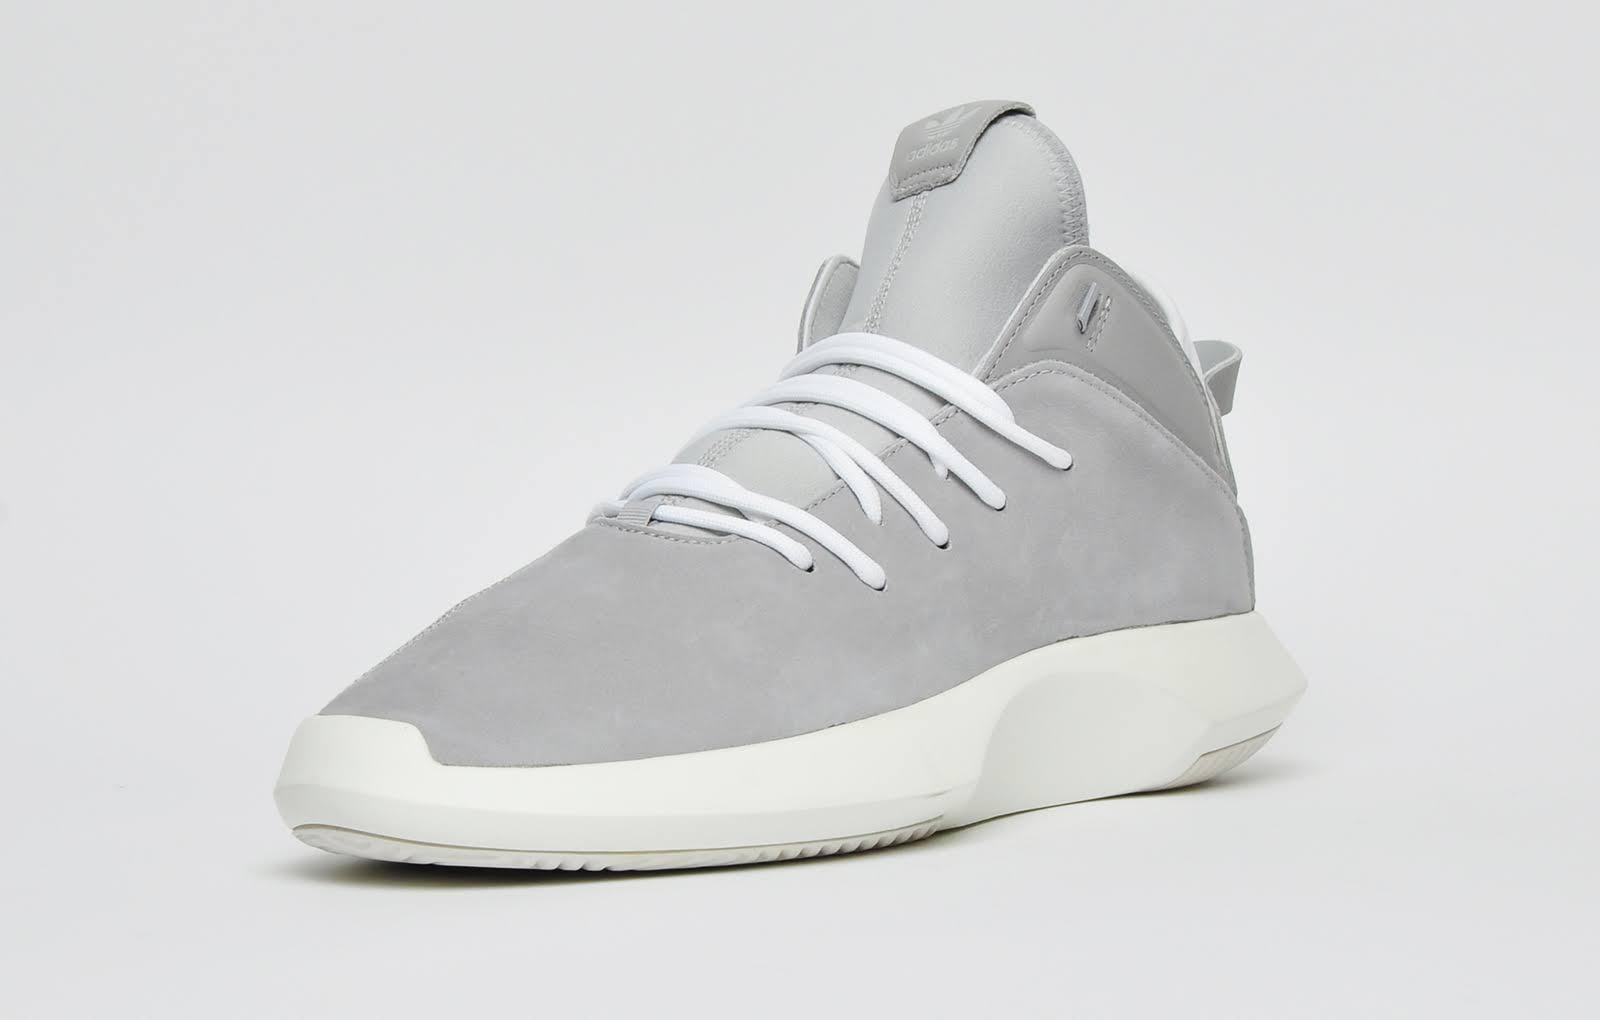 (13) Adidas Originals Crazy 1 ADV Mens Trainers sneakers